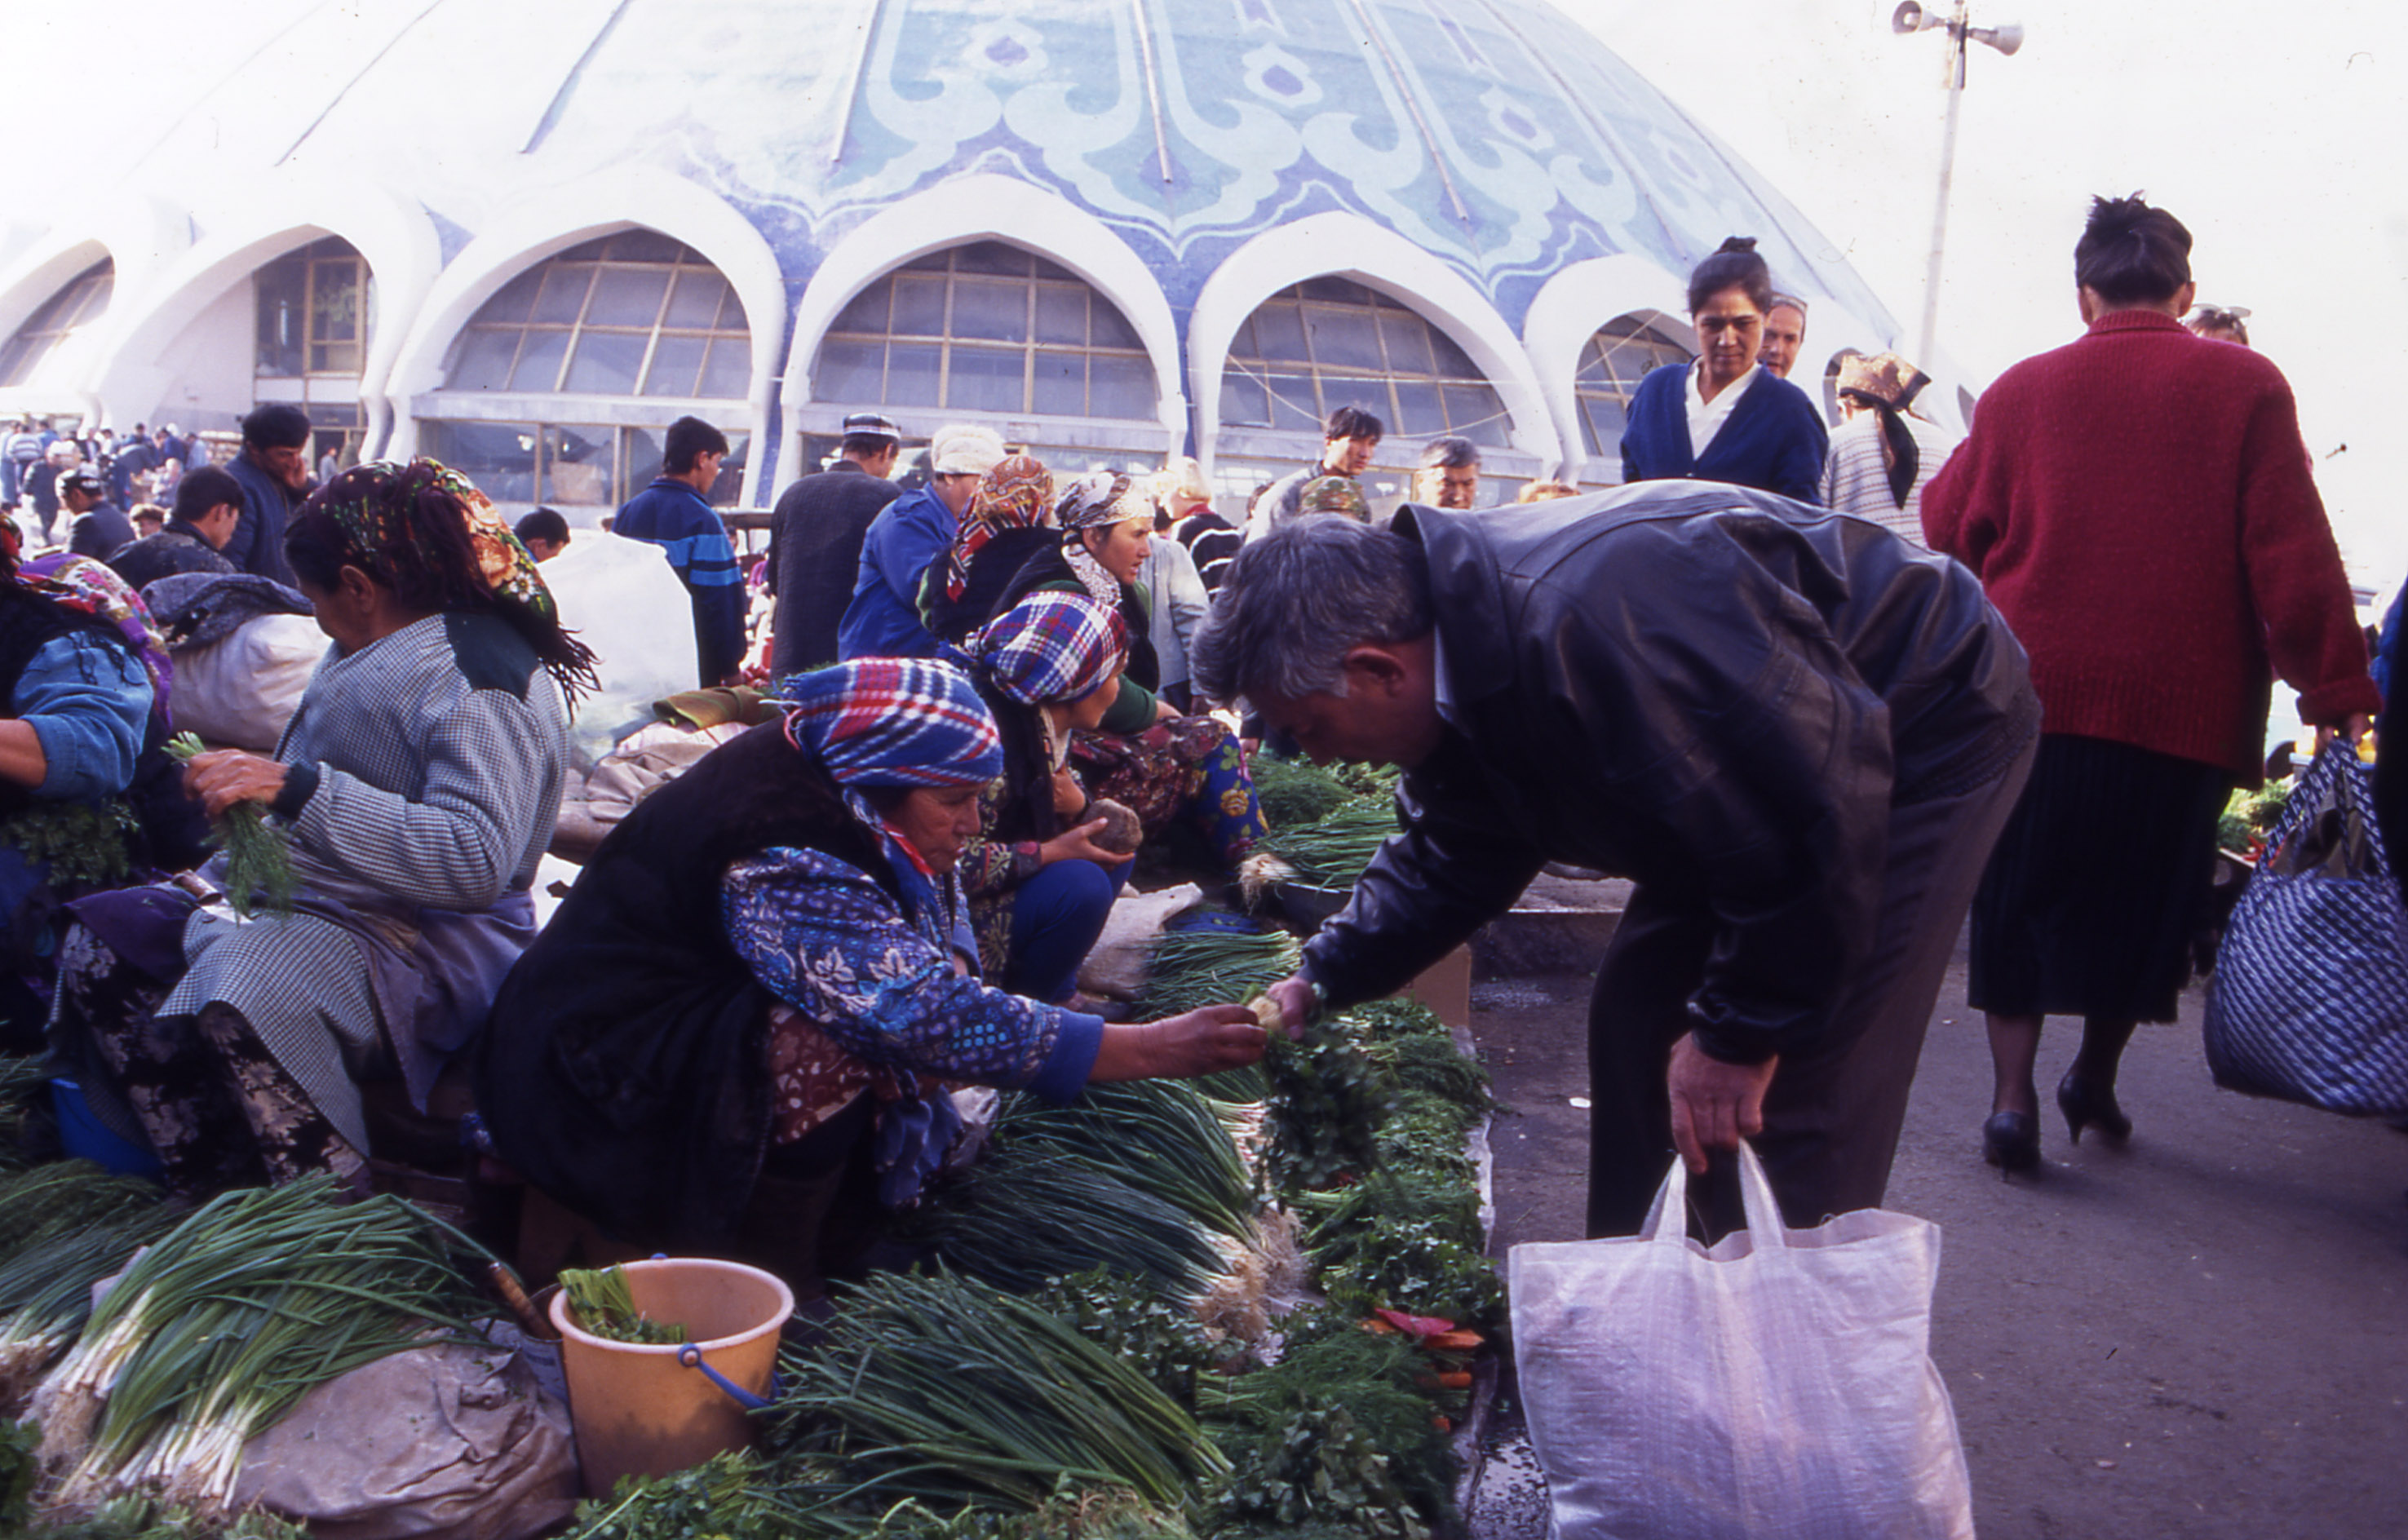 The Chorsu Bazaar in central Tashkent